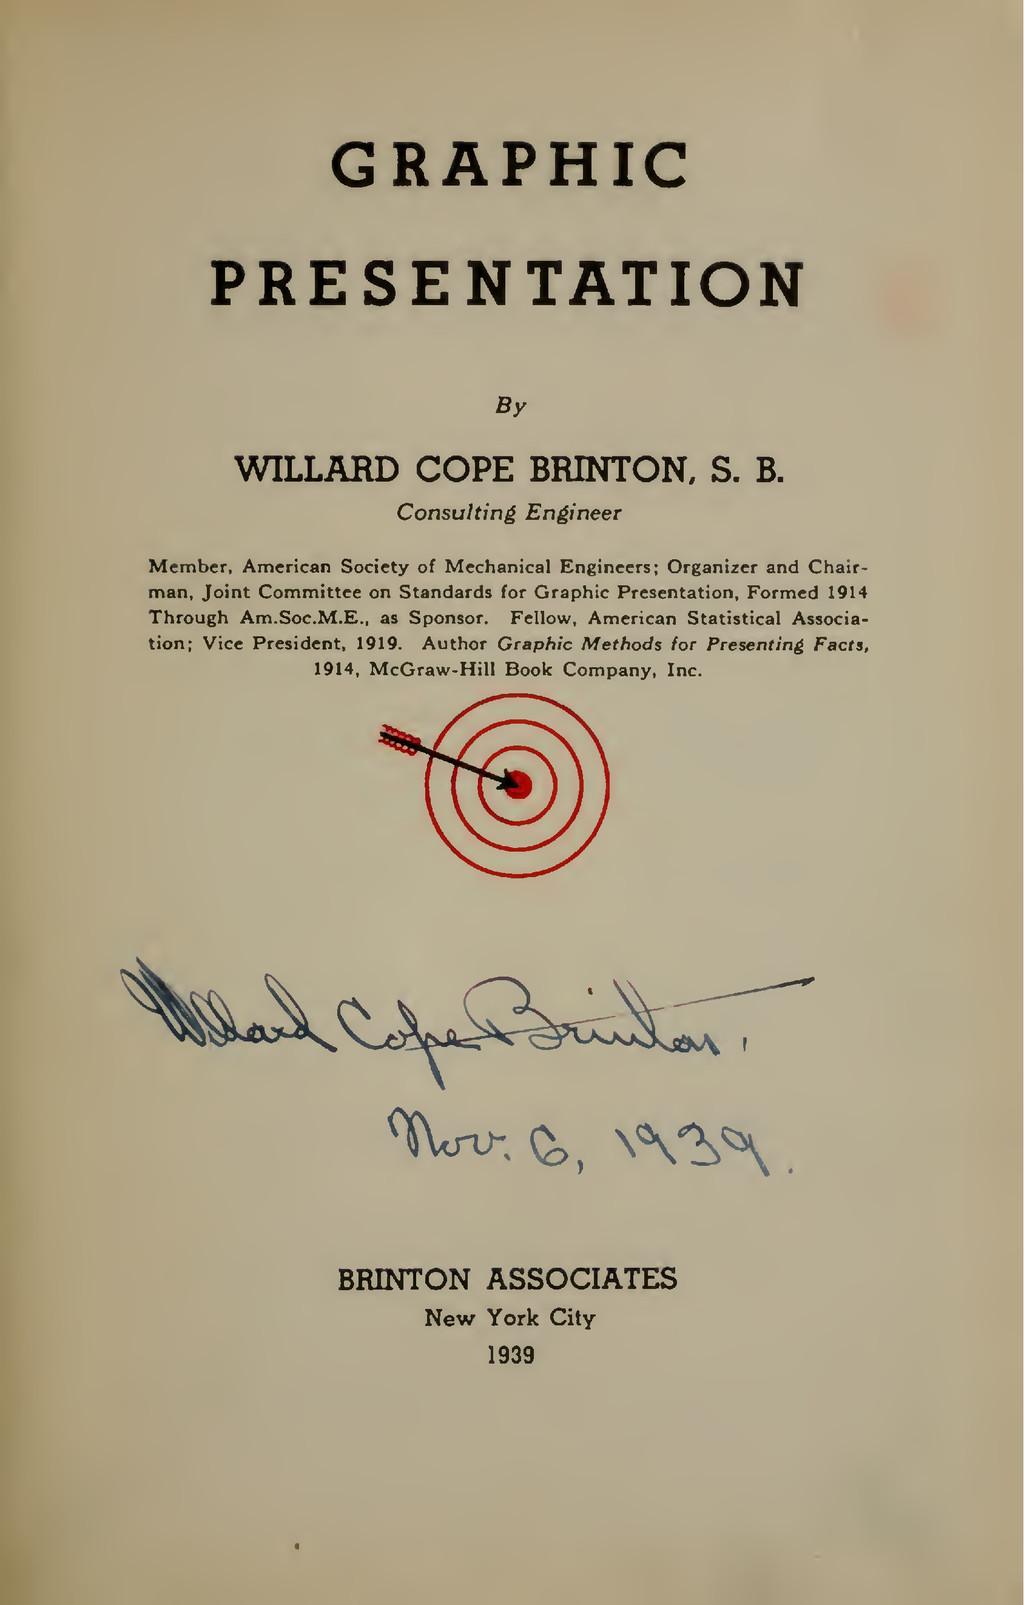 GRAPHIC PRESENTATION By WILLARD COPE BRINTON, S...